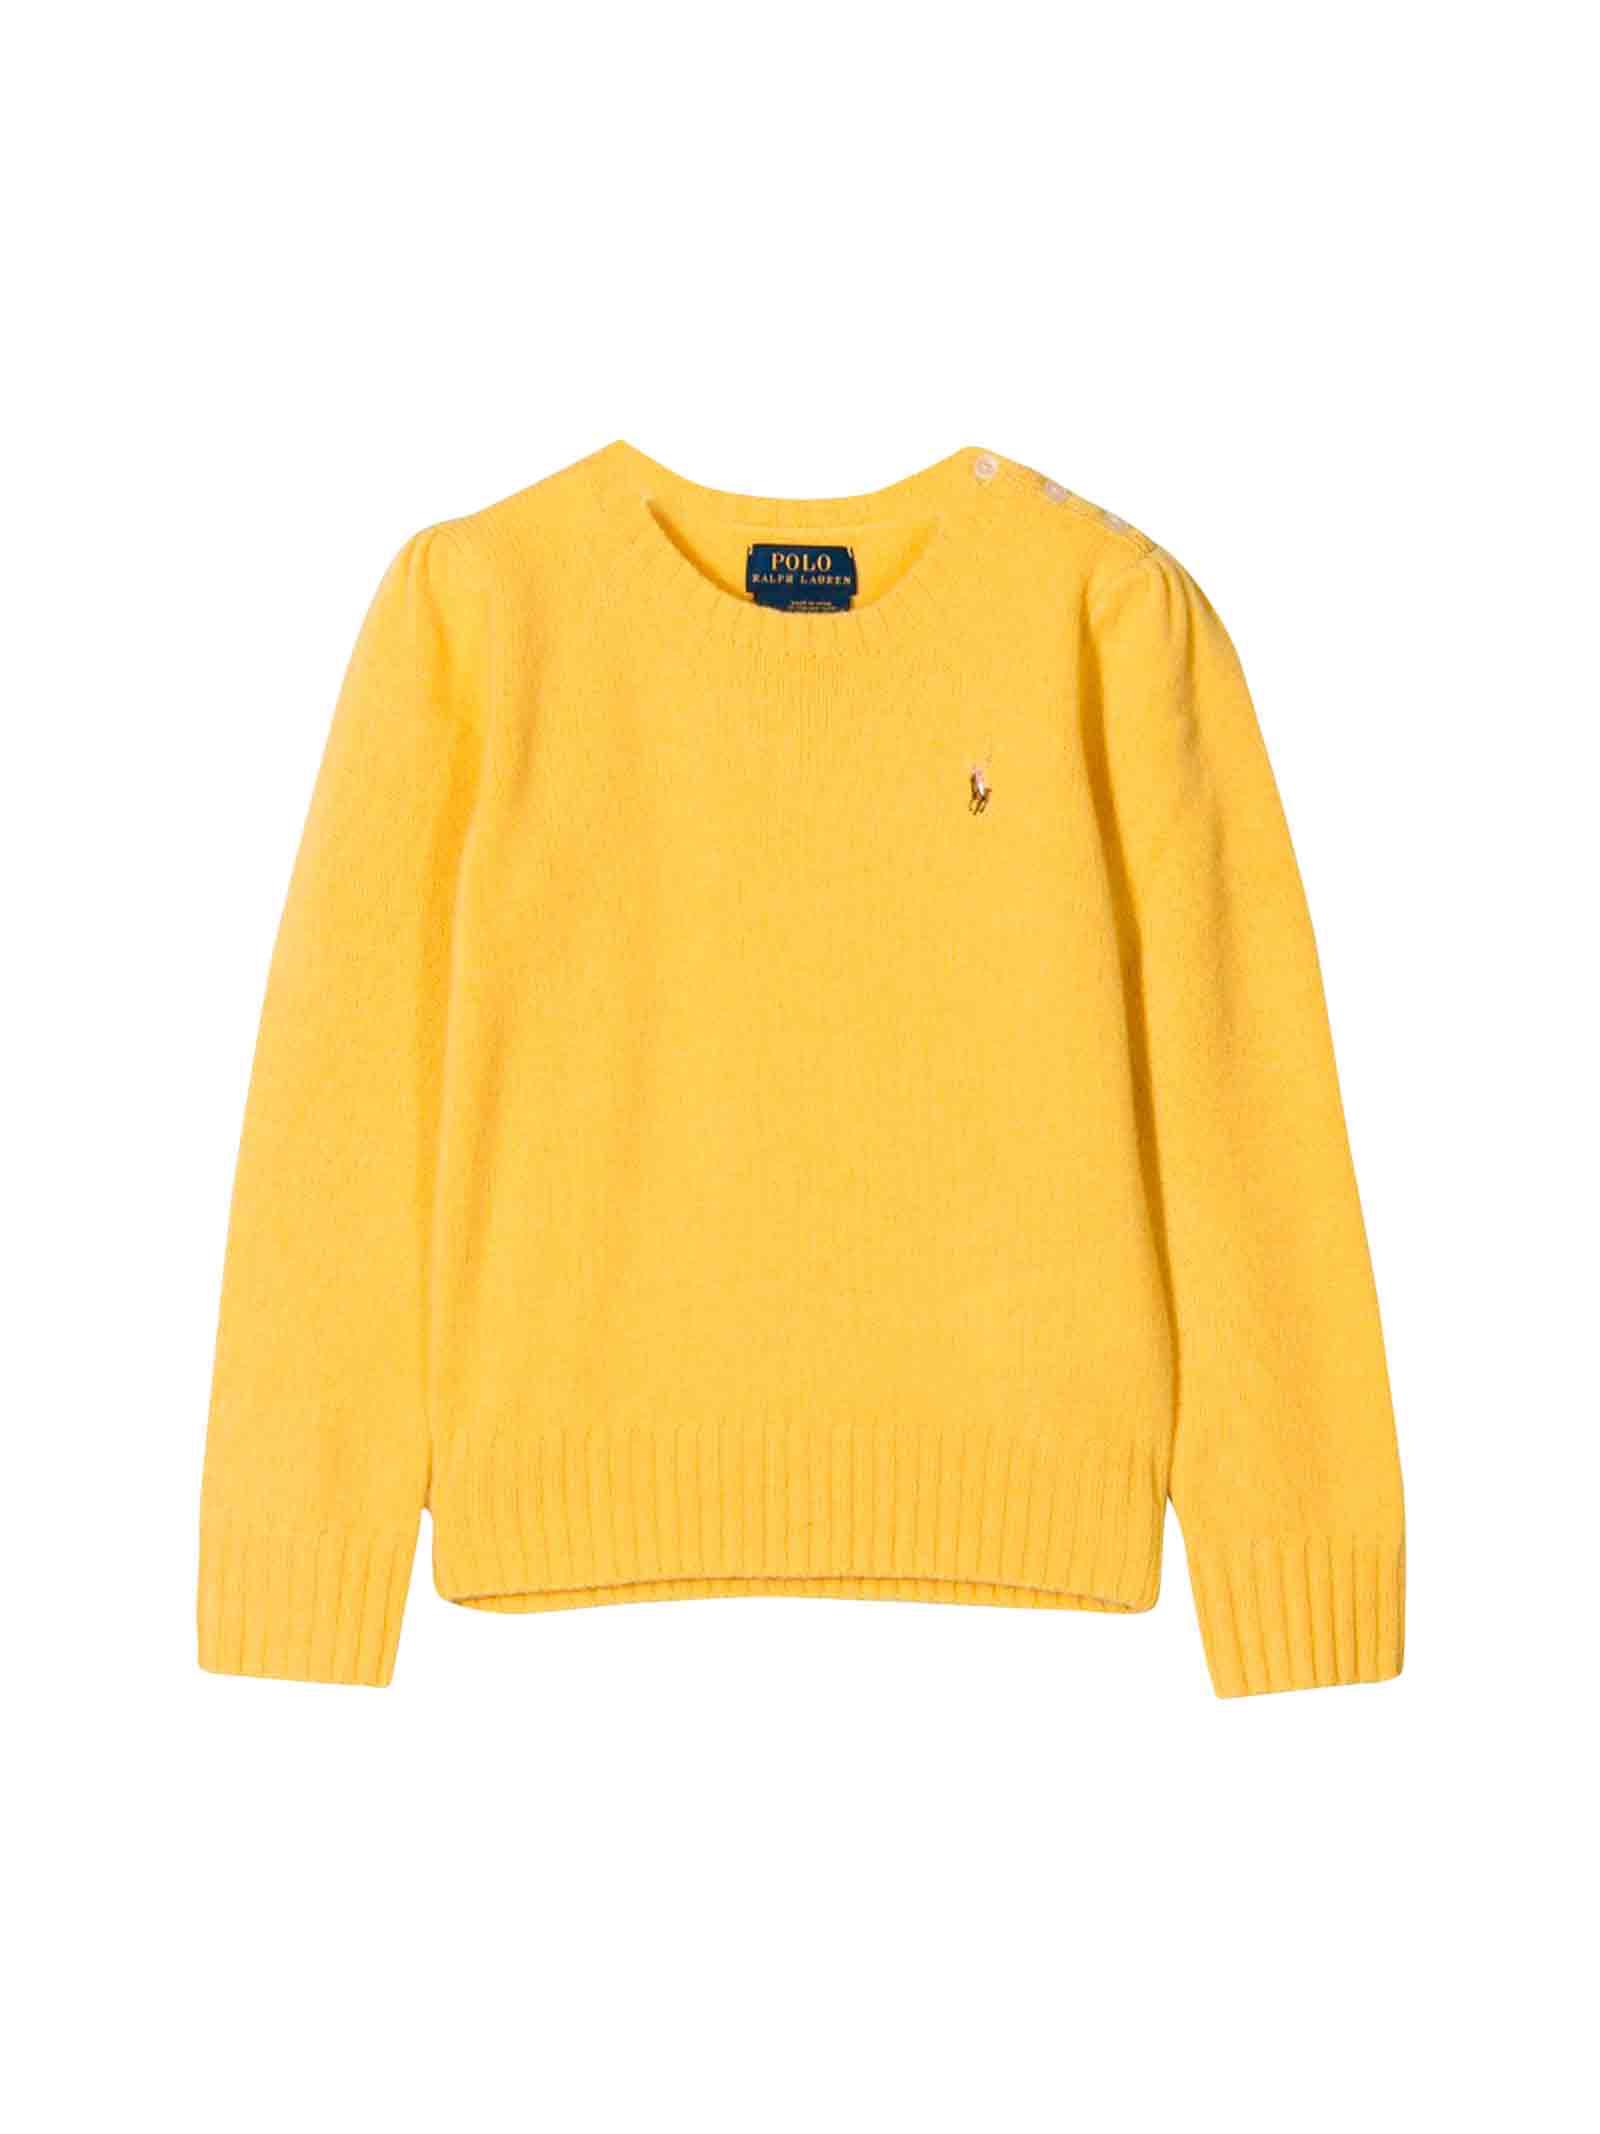 low priced 0534c e3575 Maglione giallo Ralph Lauren kids teen